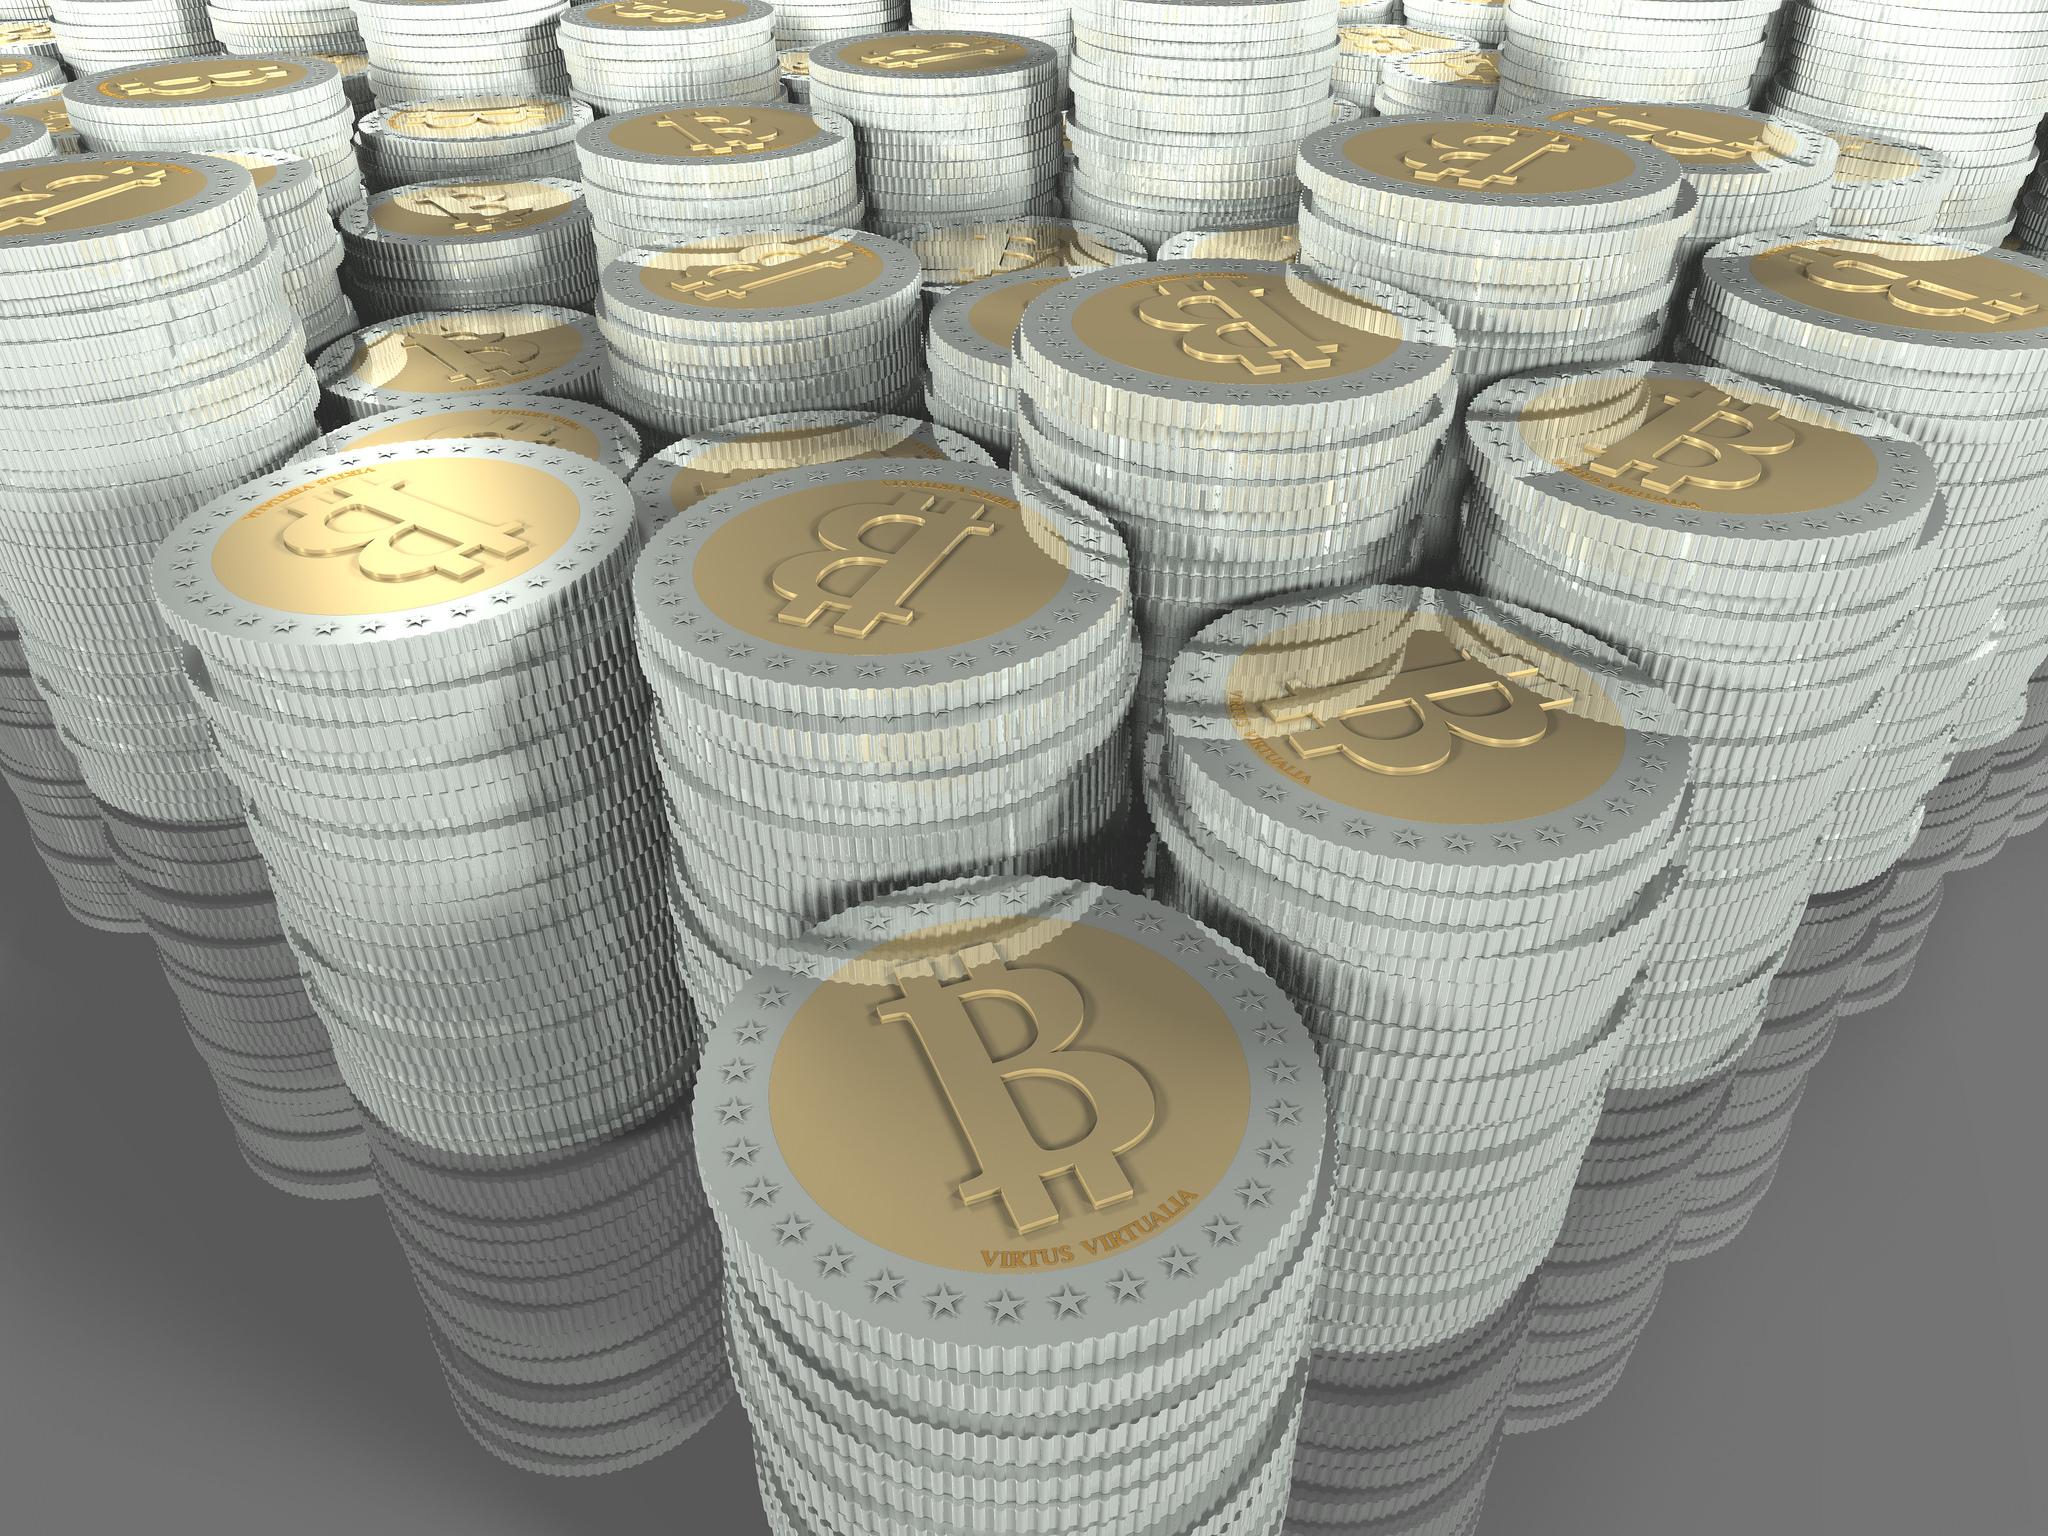 Alpari、ビットコイン(BTC)の取り扱いを開始